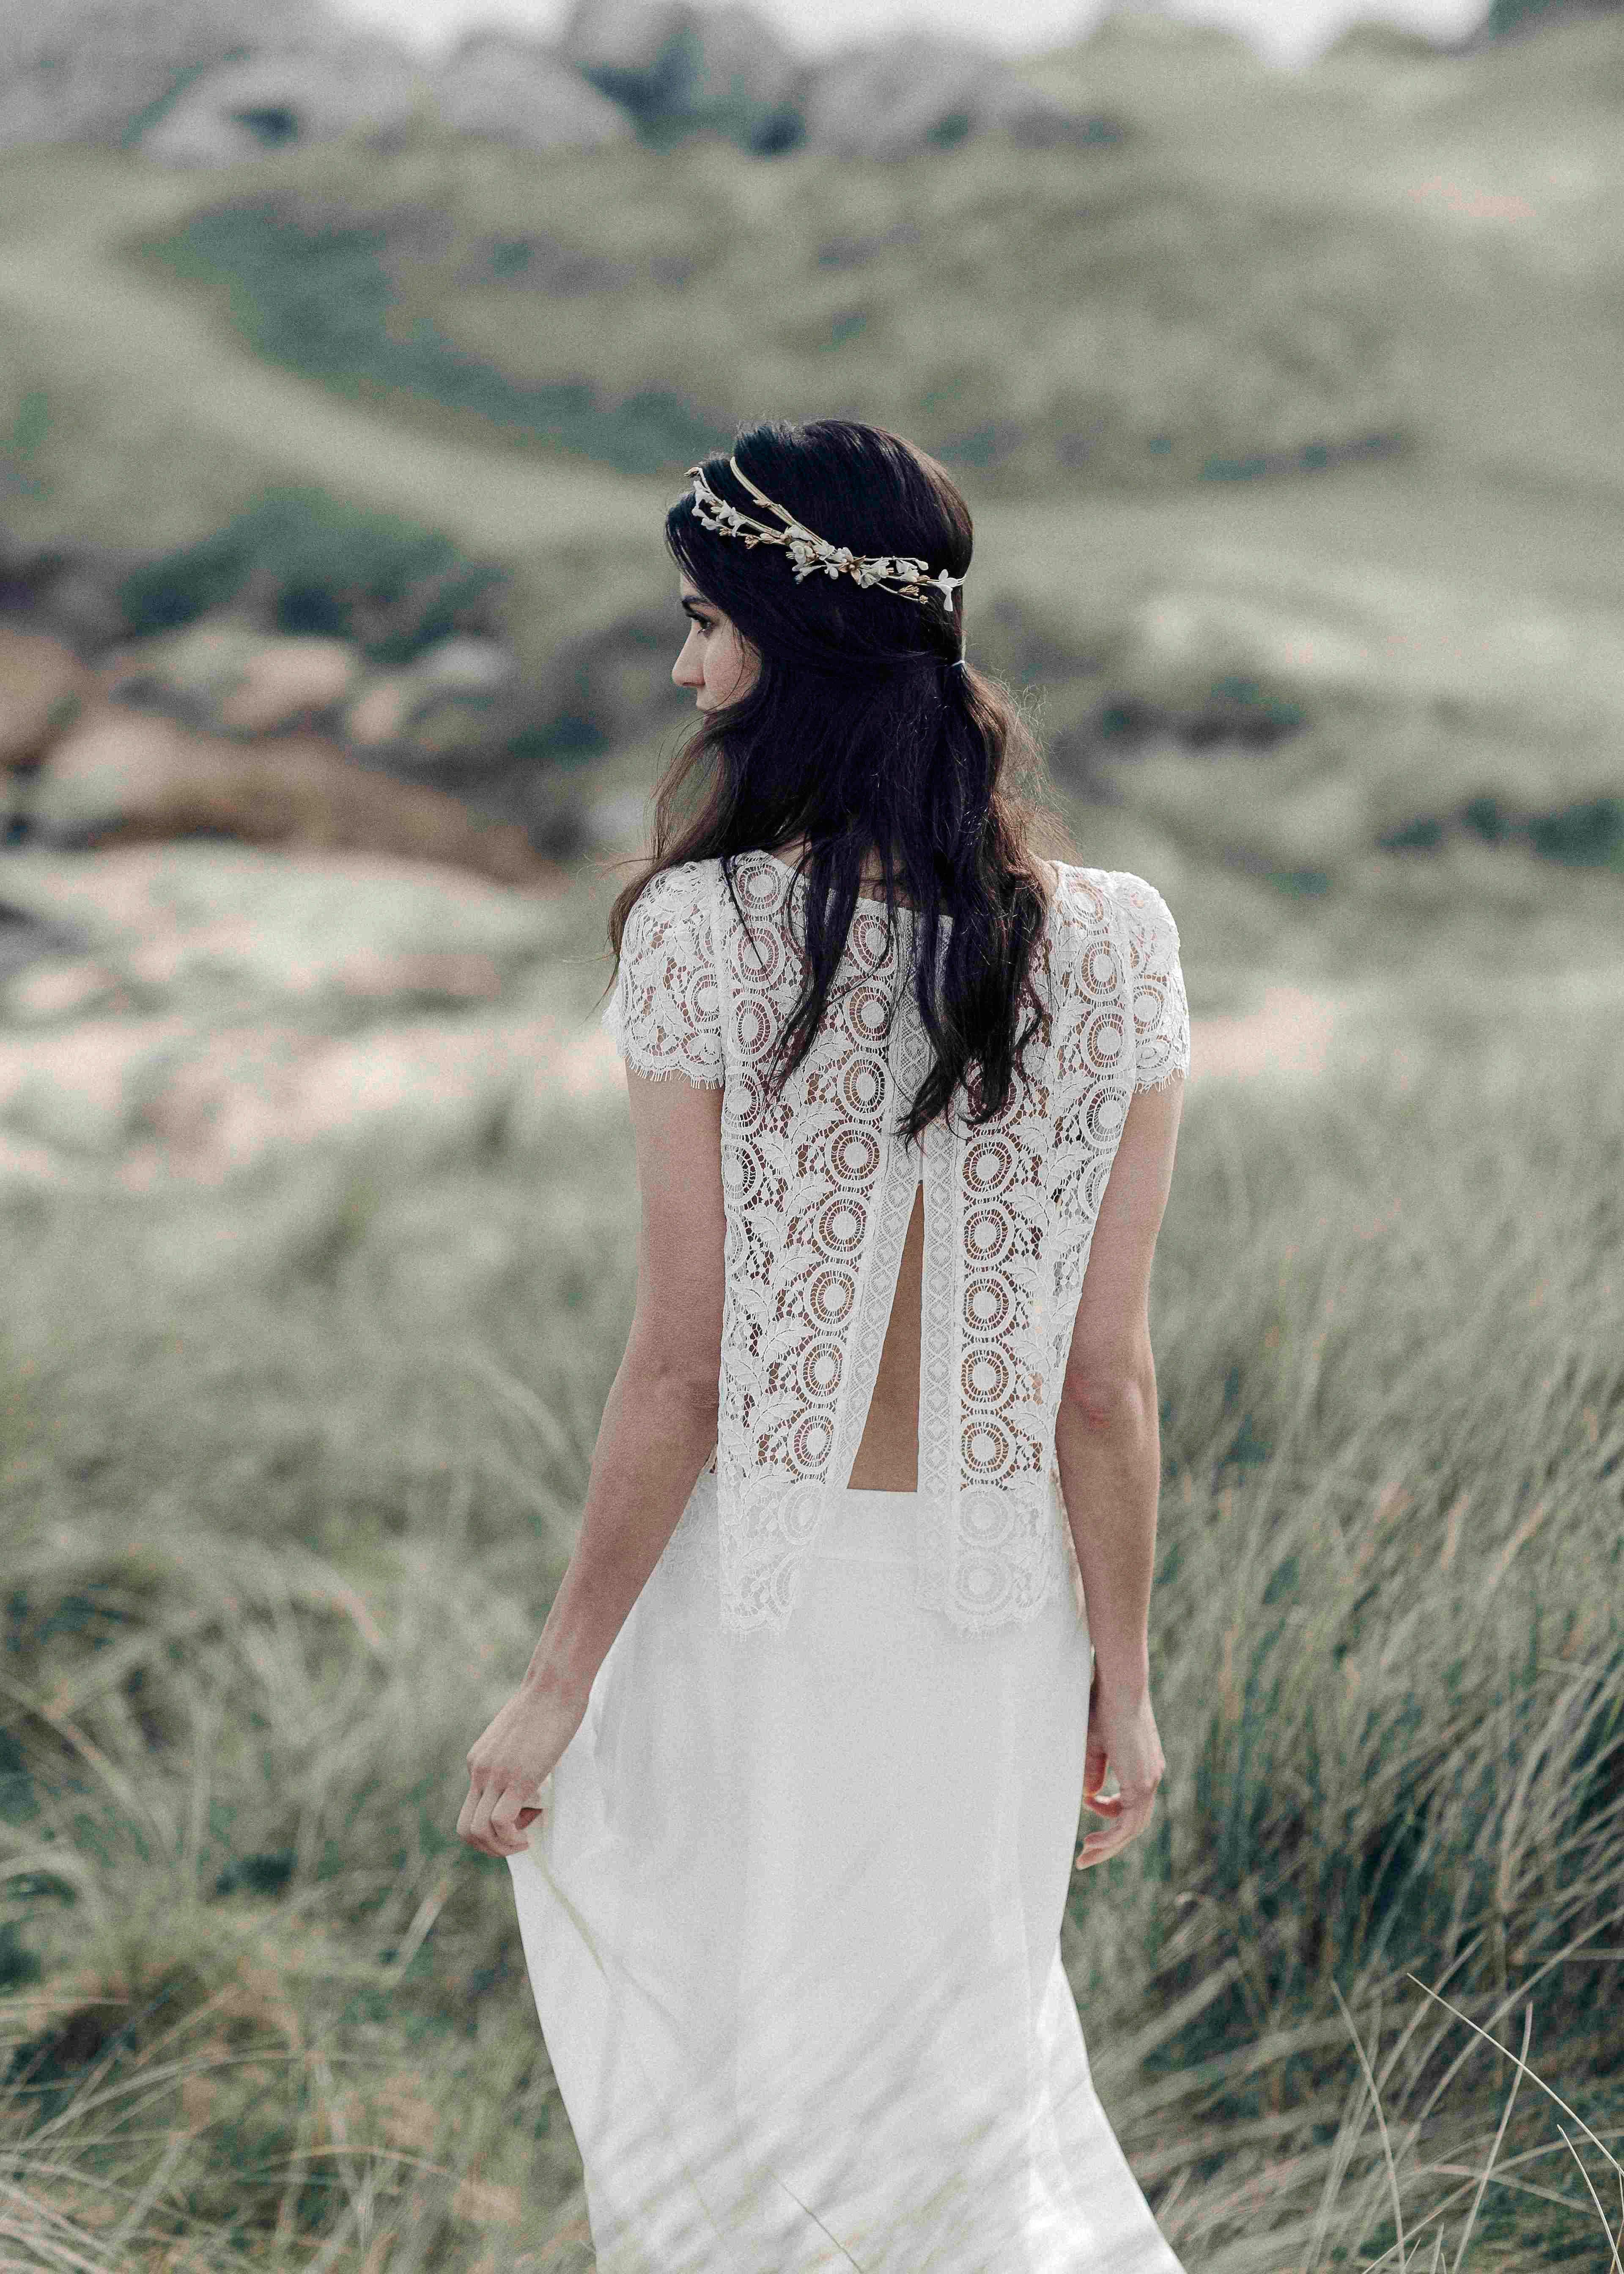 Laure de Sagazan Spring 2018 Wedding Dress Collection